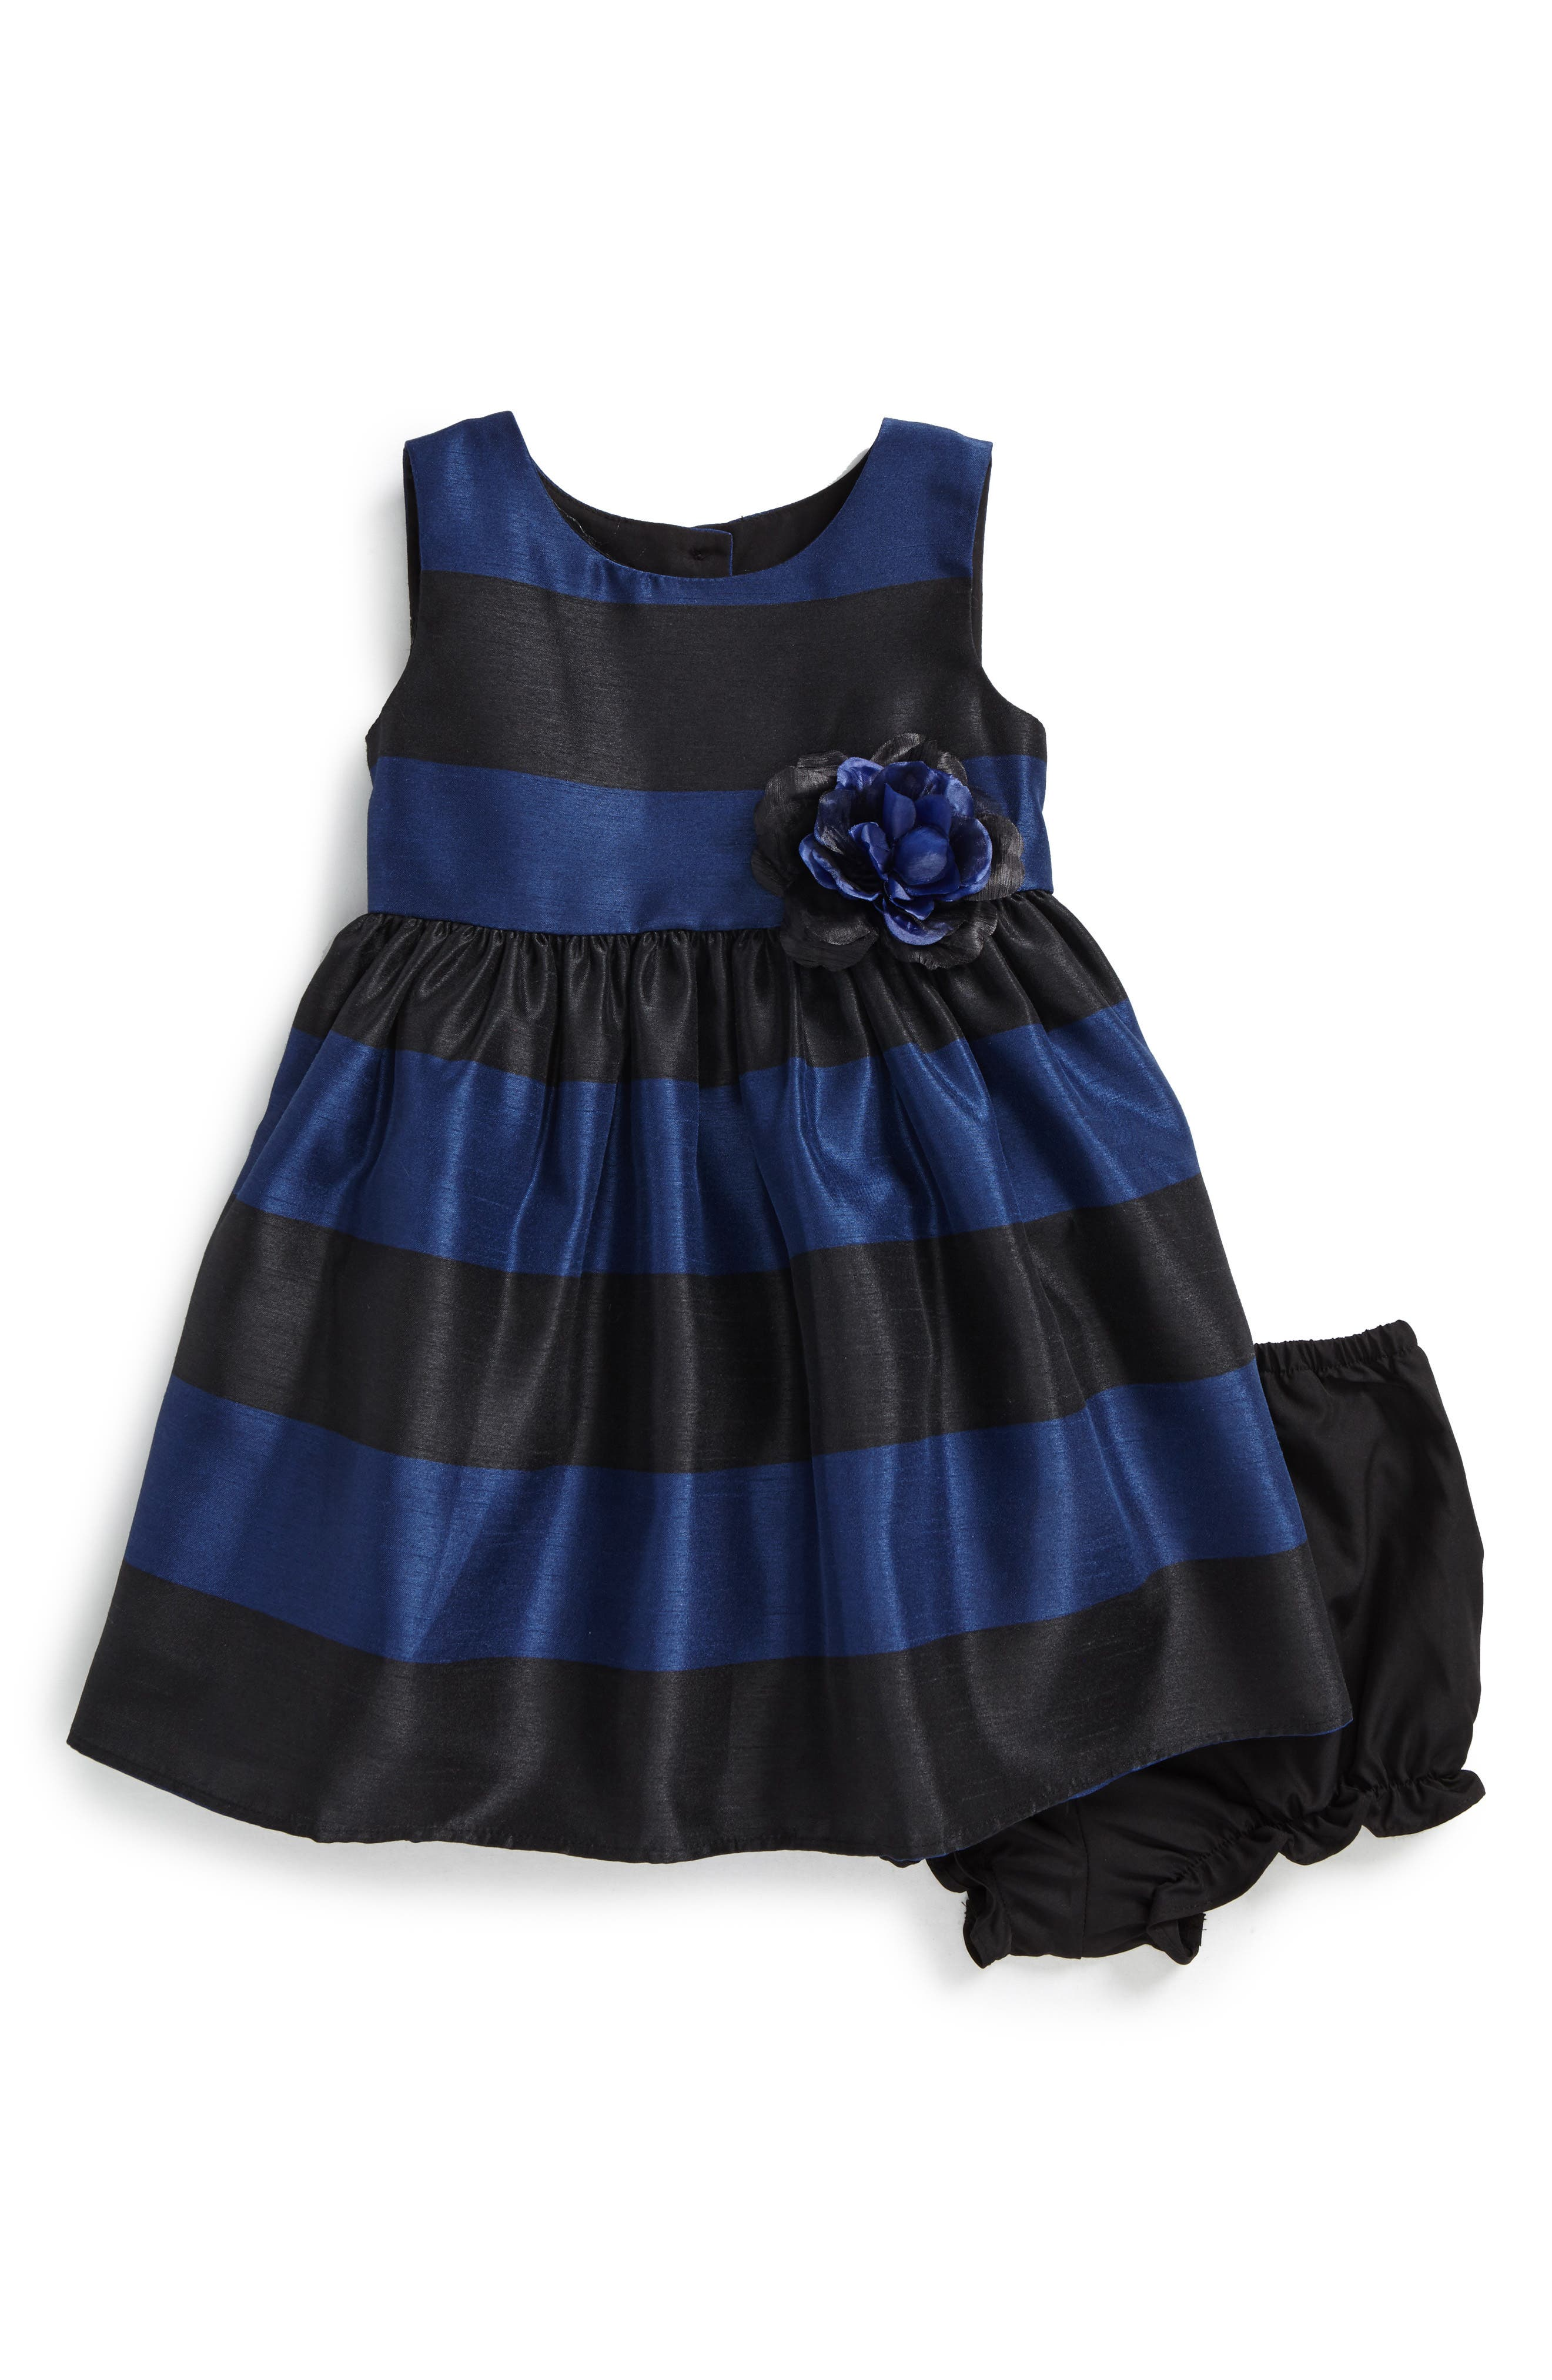 Main Image - Frais Stripe Party Dress (Baby Girls)